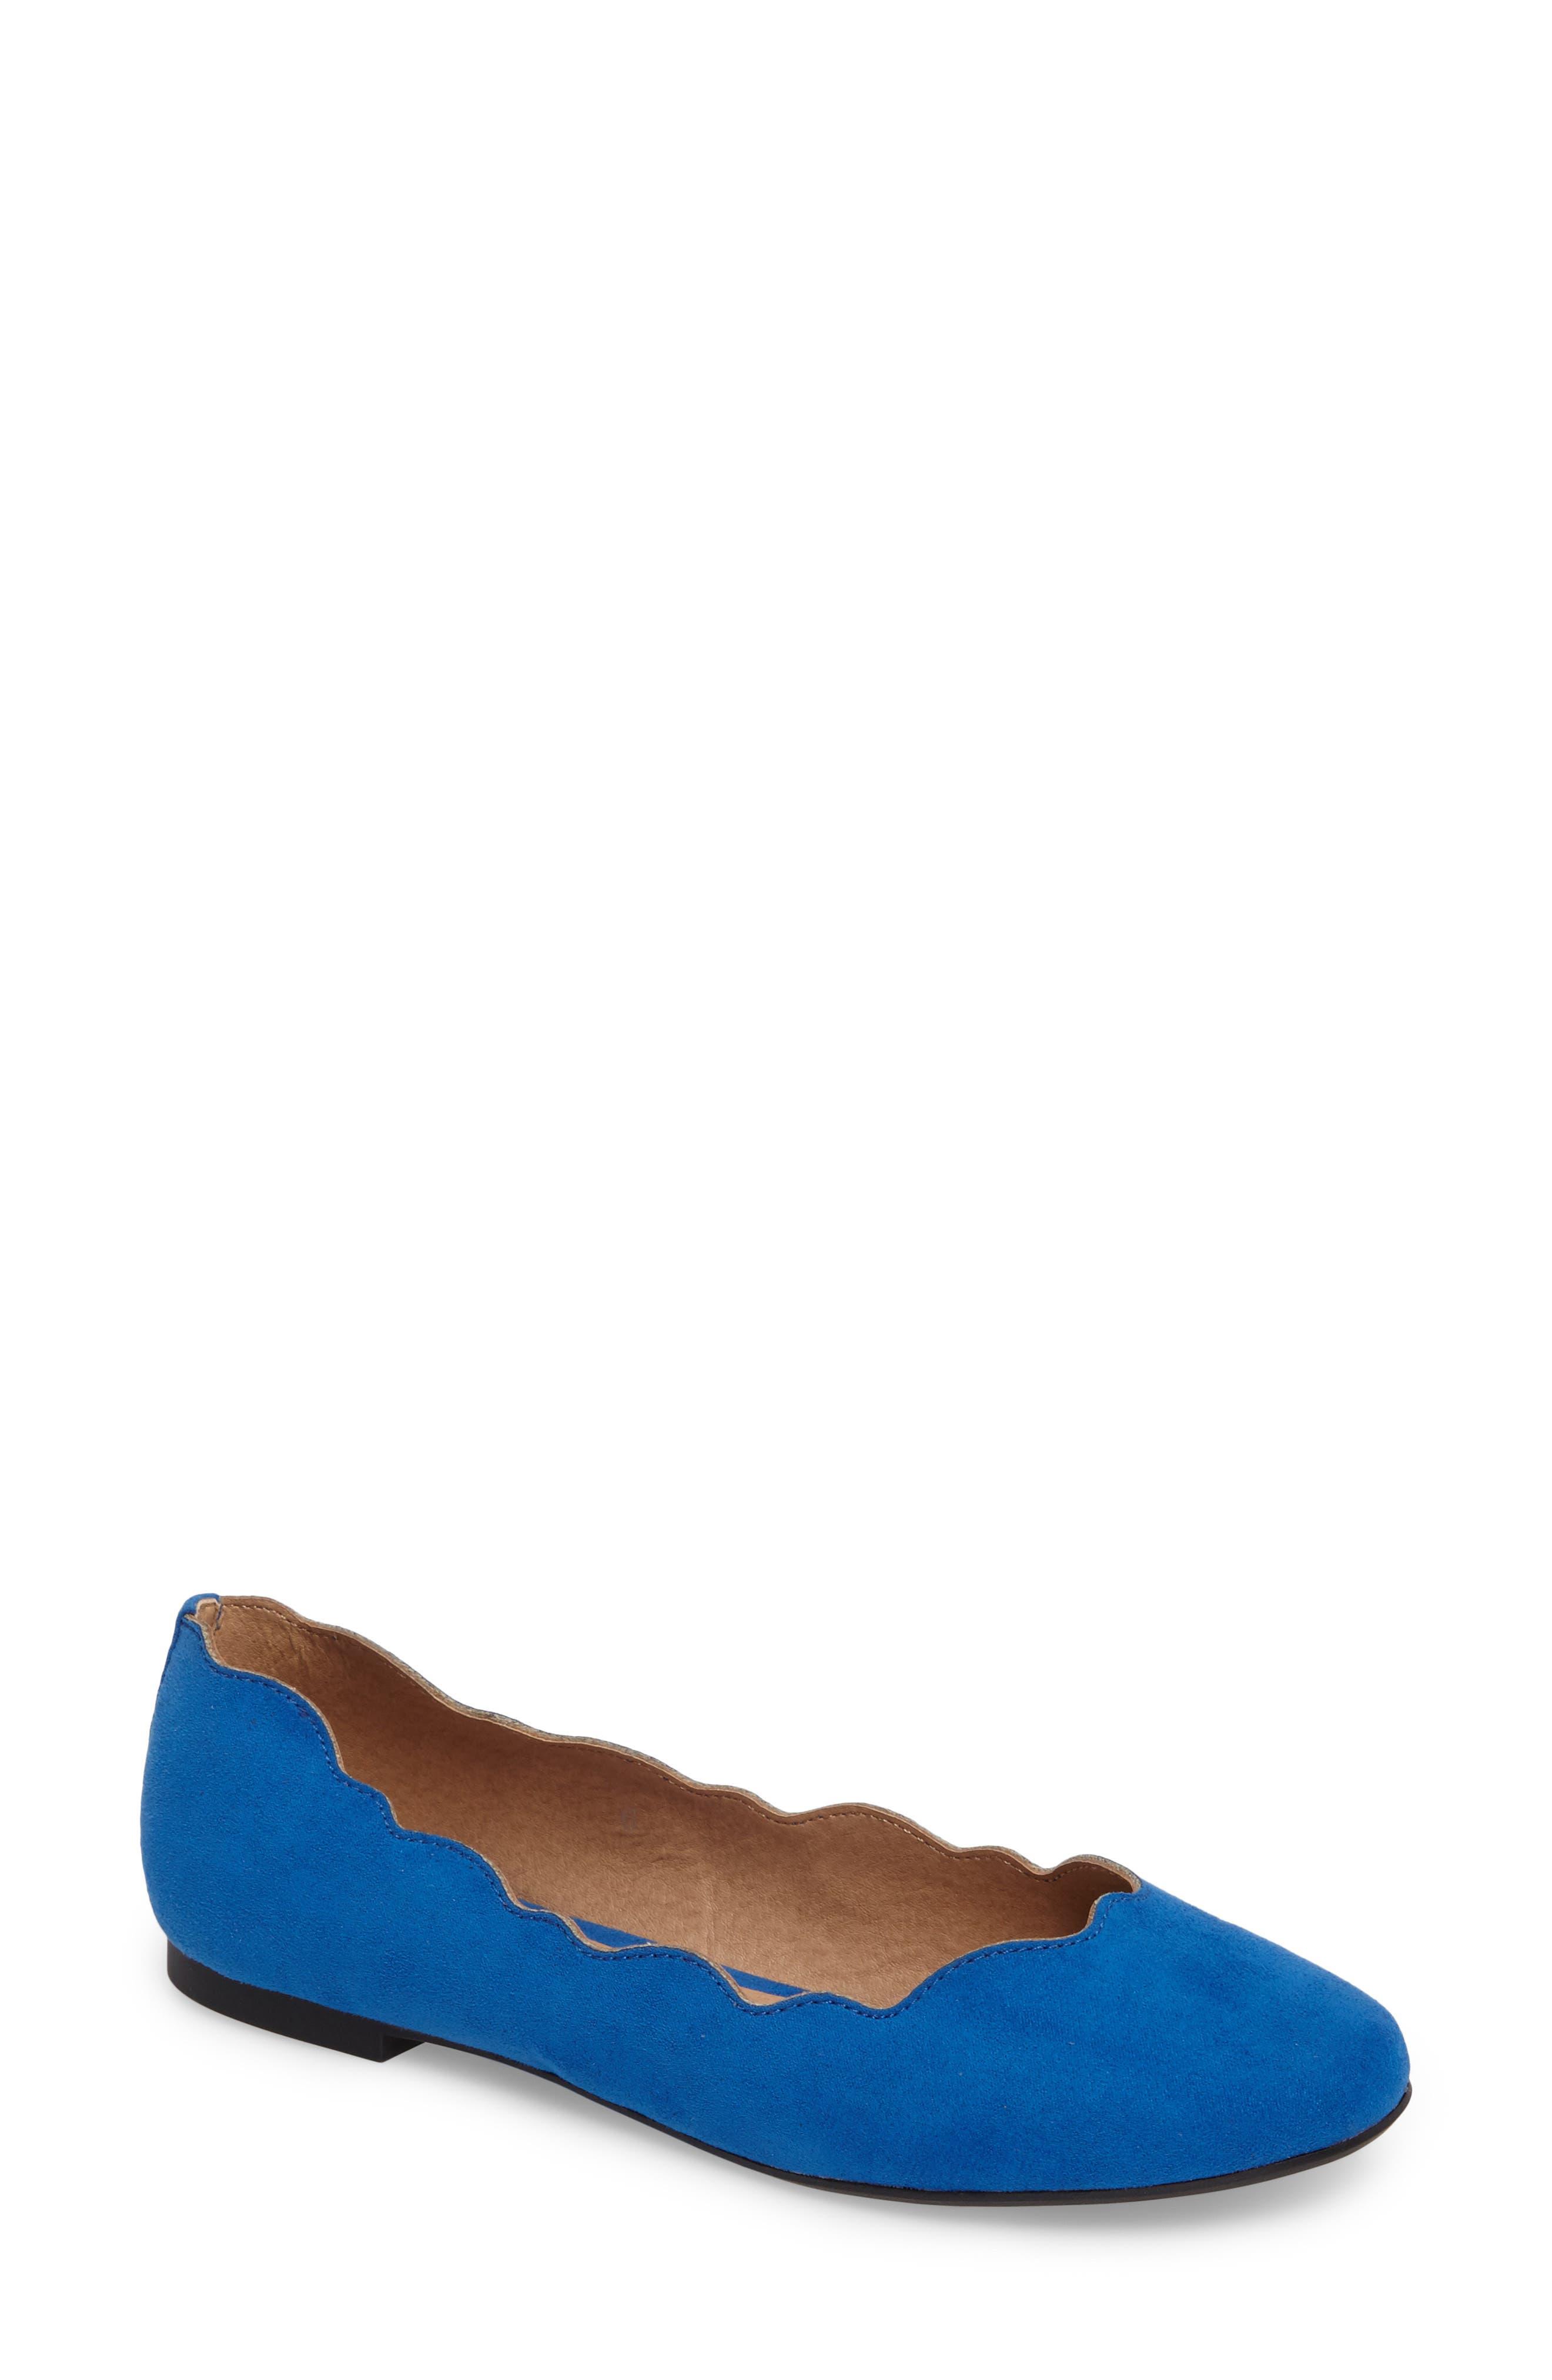 Tallye Ballet Flat,                         Main,                         color, Royal Blue Faux Suede